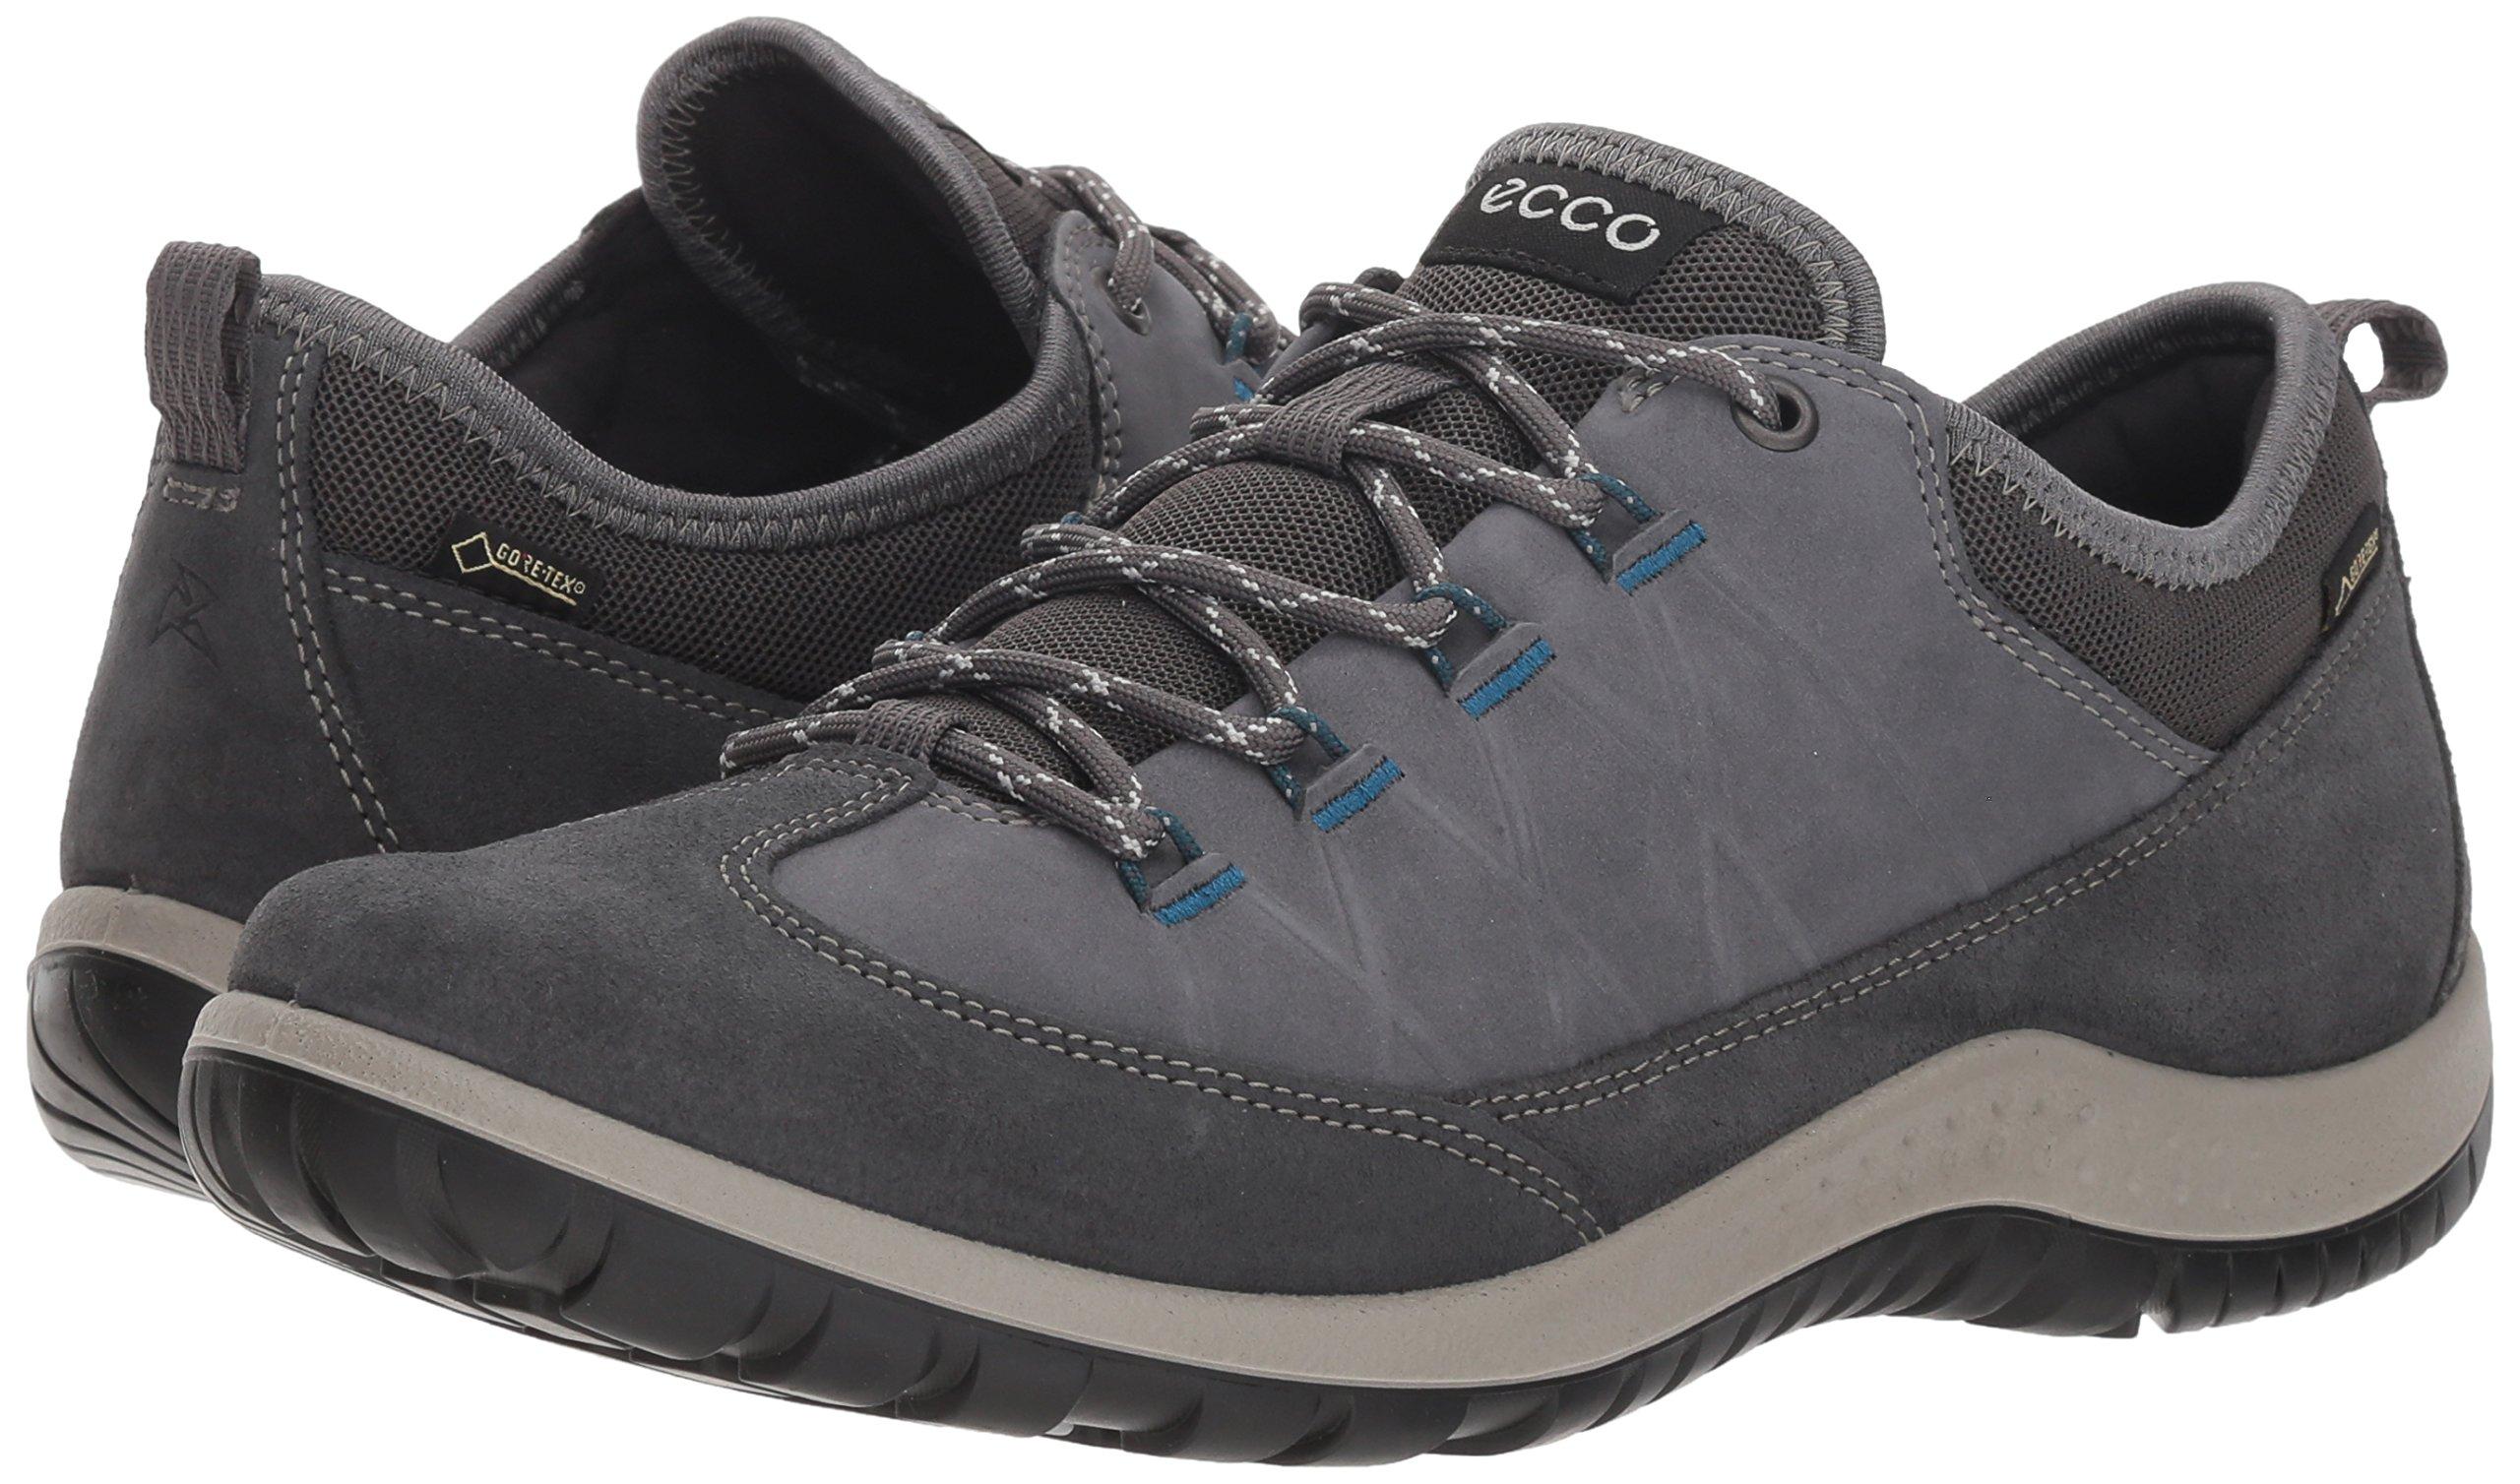 ECCO Women's Aspina Low Rise Hiking Shoes